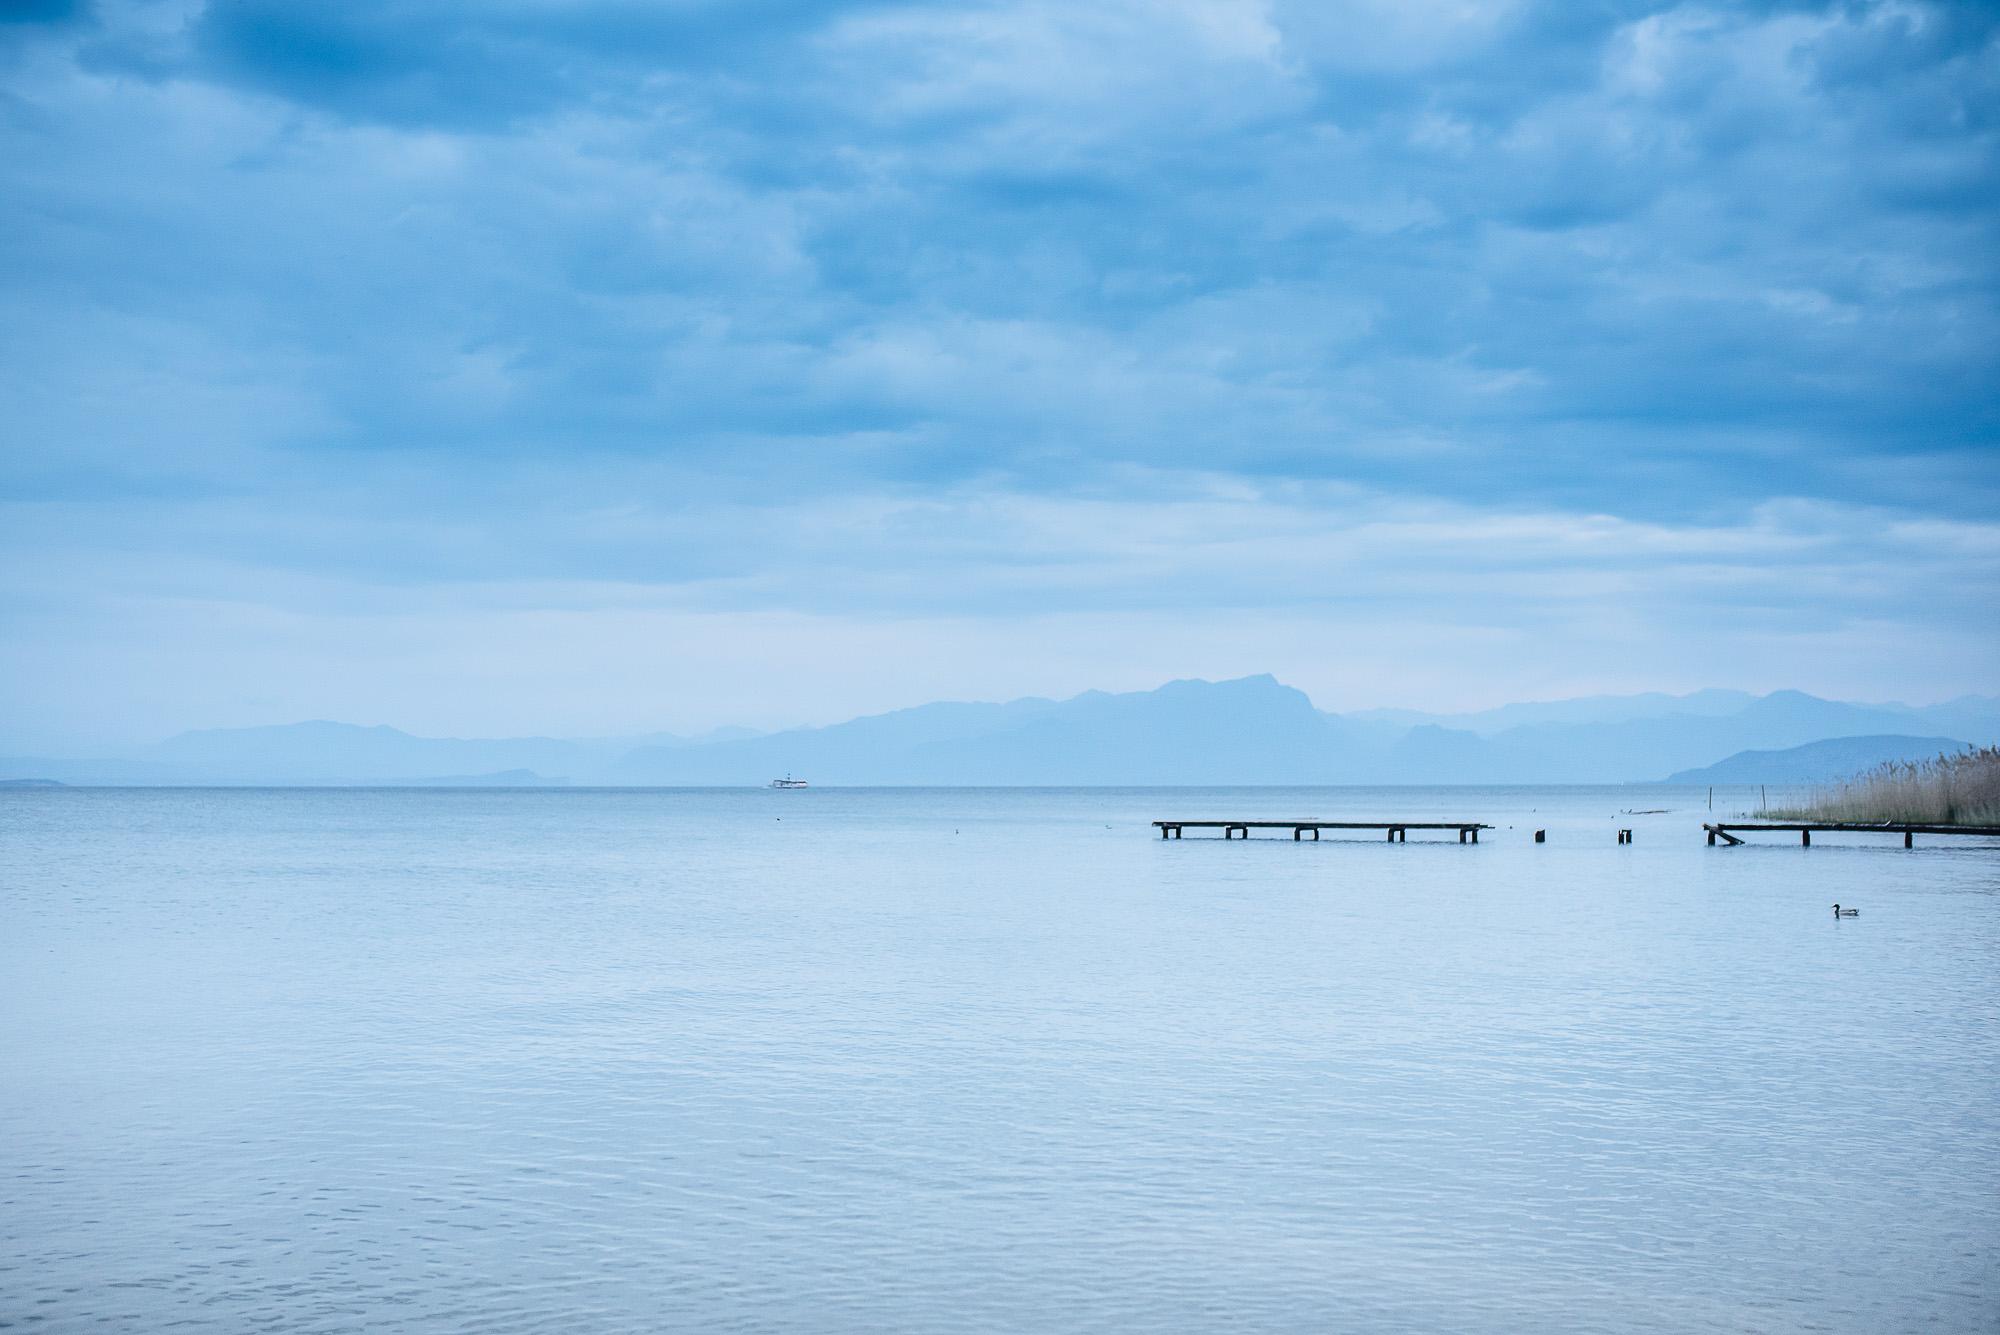 OurBeautifulAdventure-LakeGarda-Italy-Blog-2-2.jpg